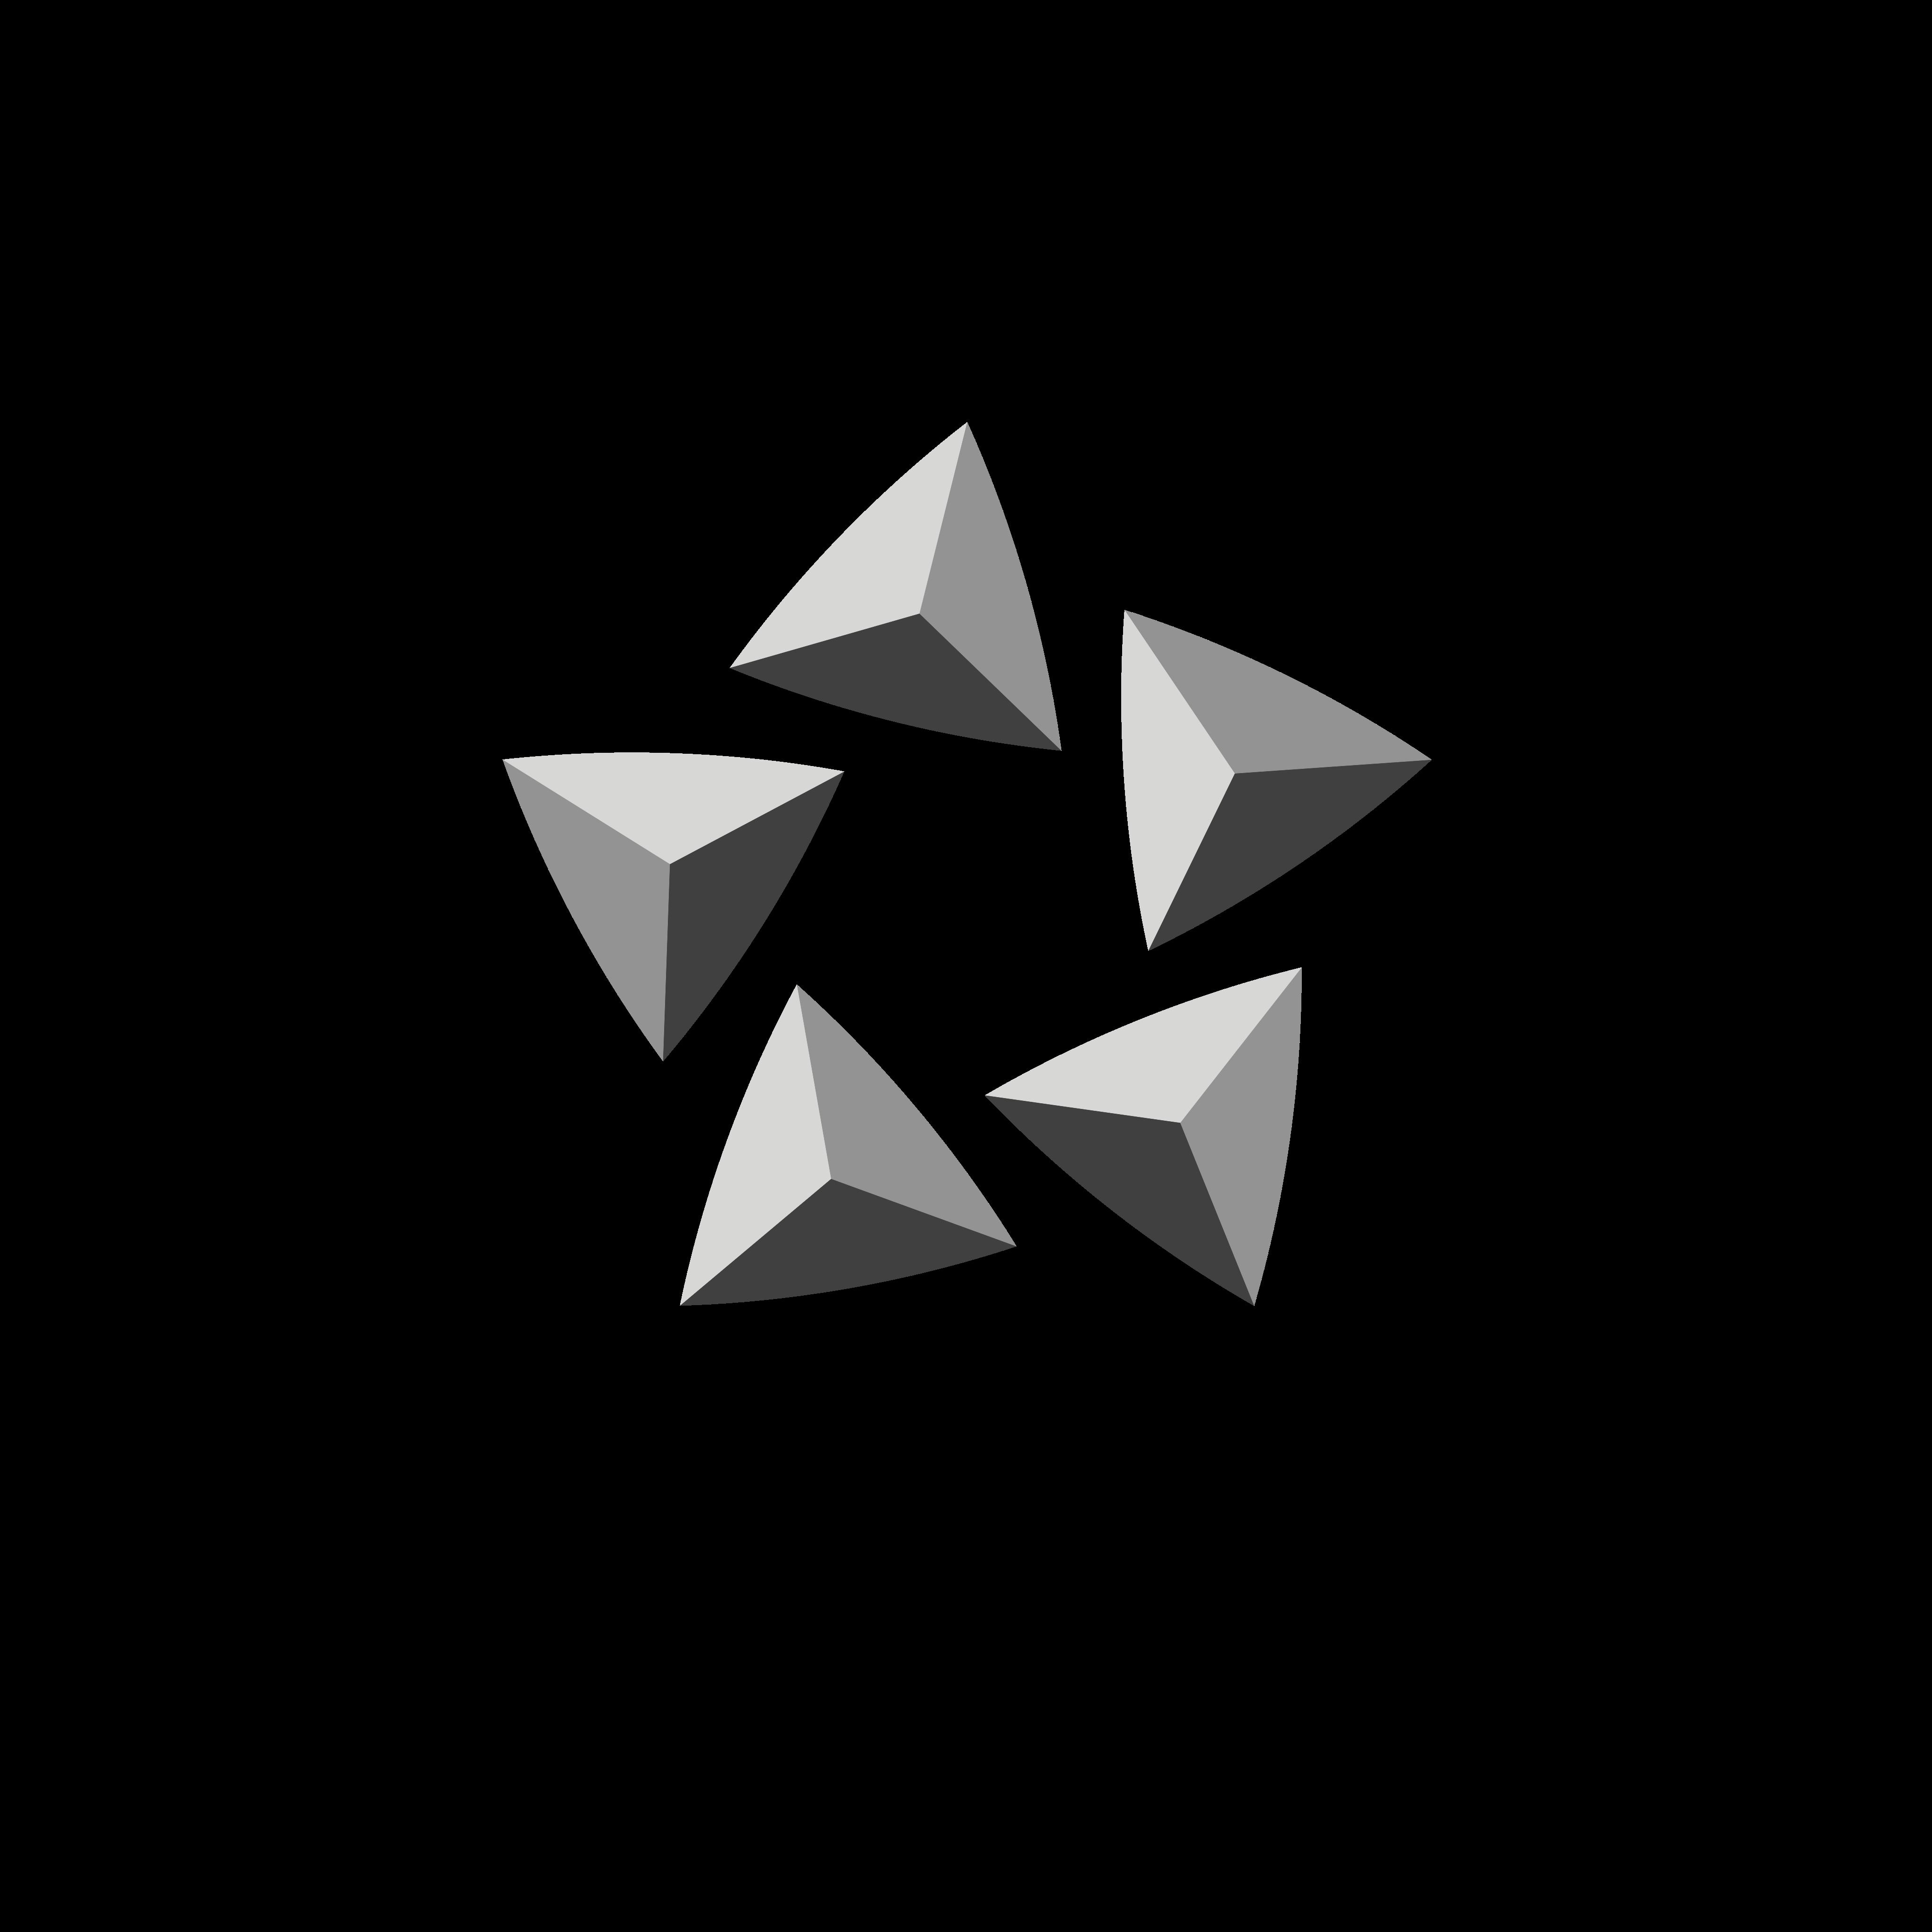 star alliance logo 0 - Star Alliance Logo